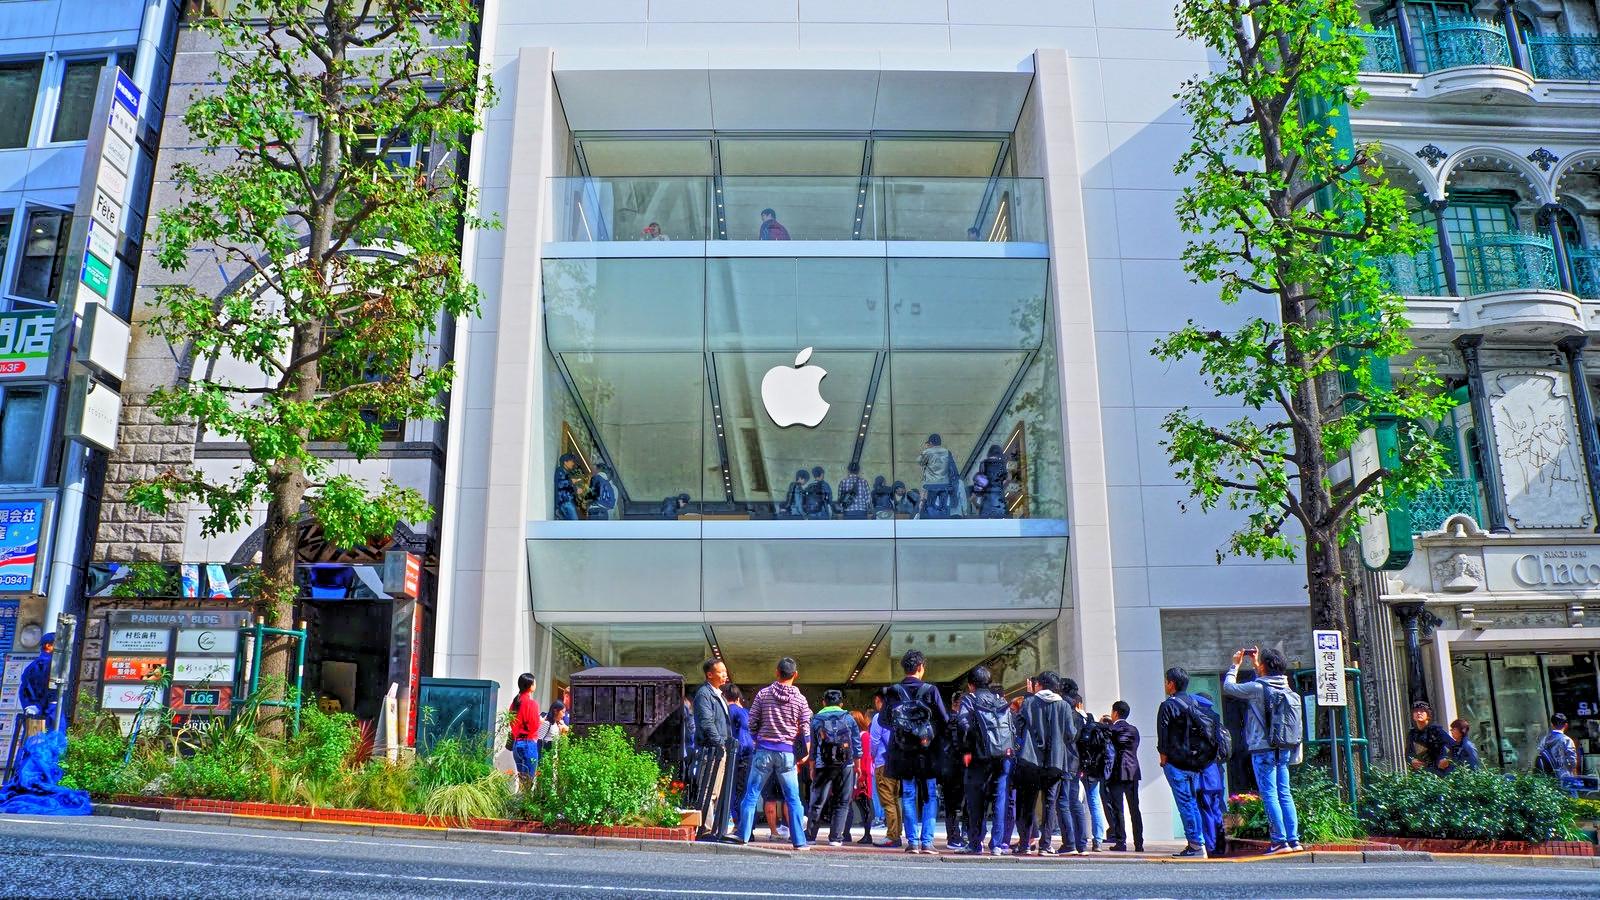 「Apple渋谷」がリニューアルオープン。700人超の行列、Tシャツの配布終了